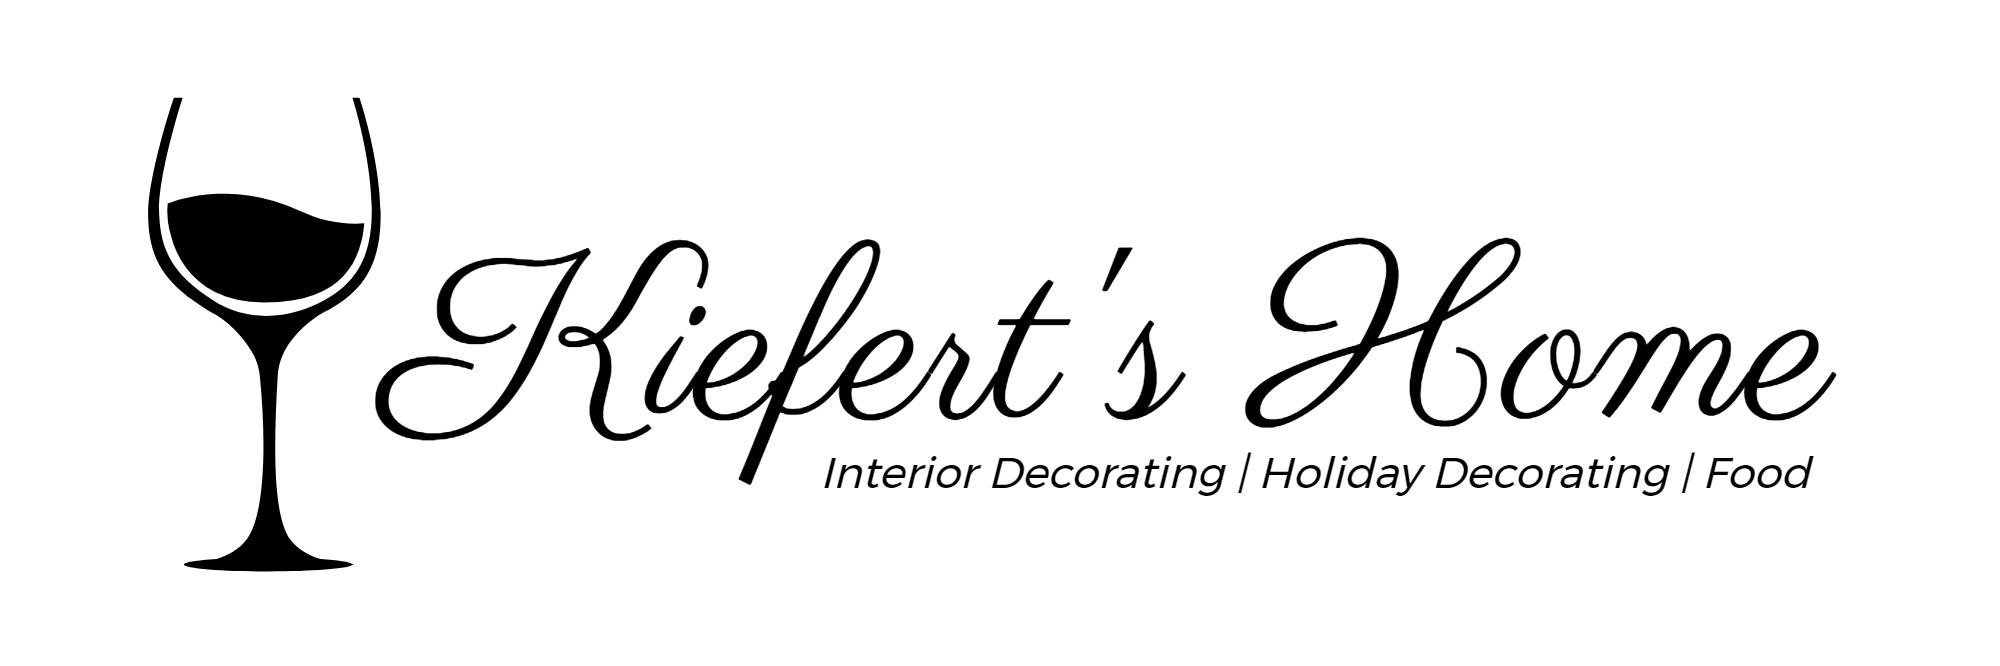 Kiefert's Home